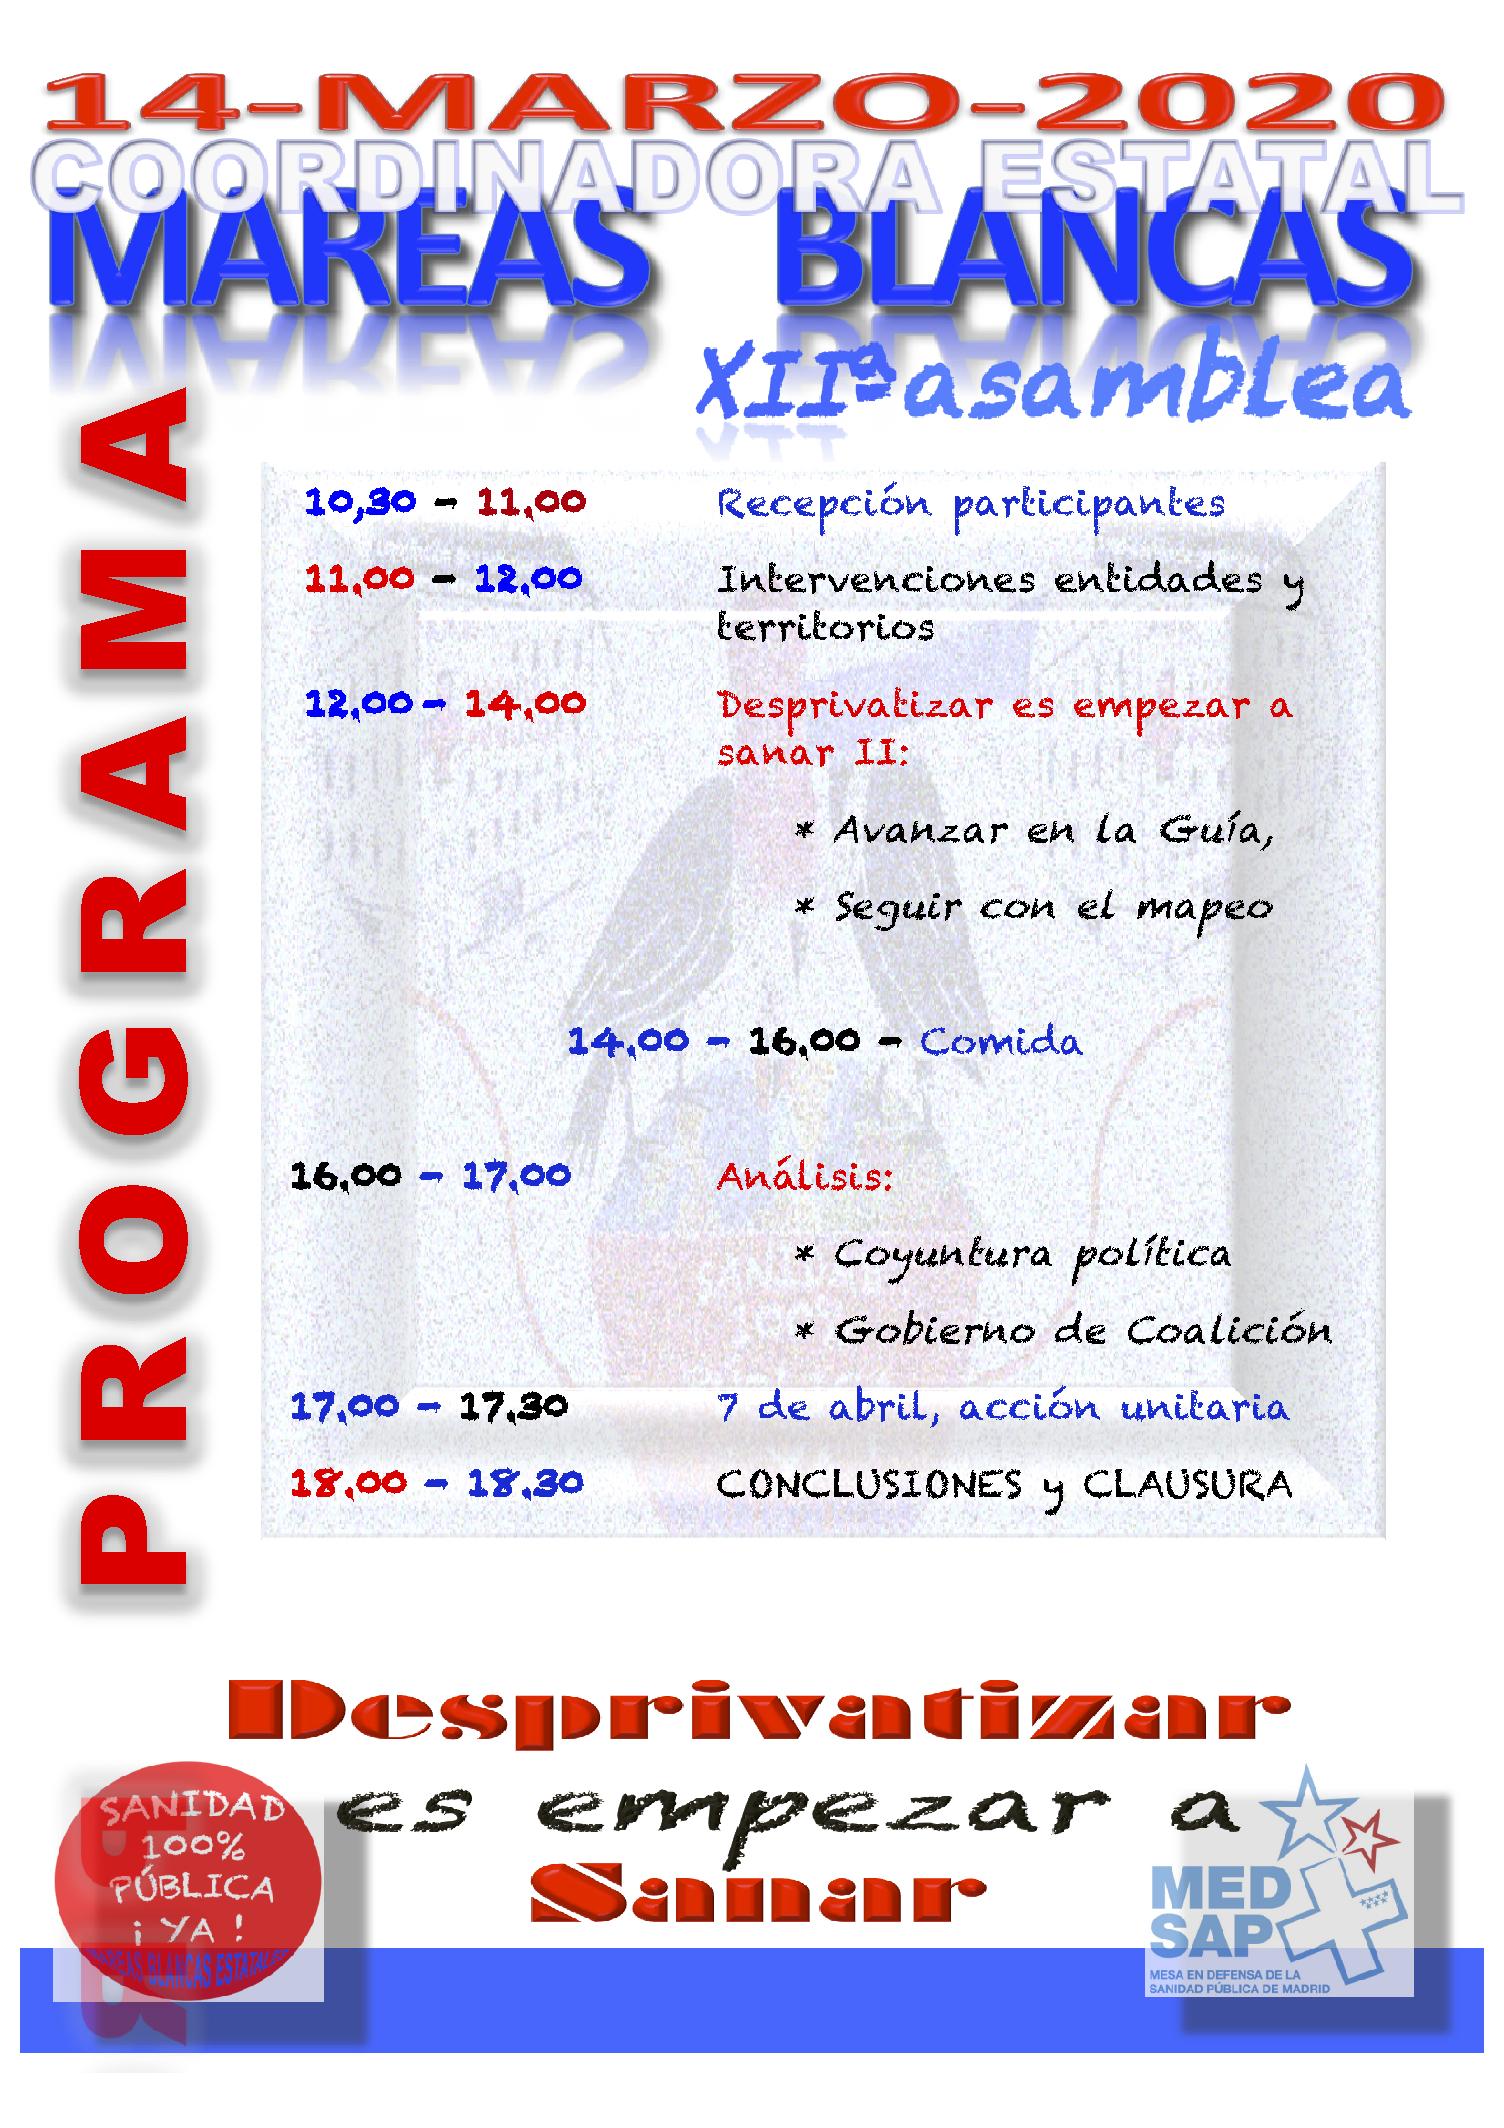 XII PROGRAMA JORNADA MAREAS ESTATALES14-03-2020.ppt